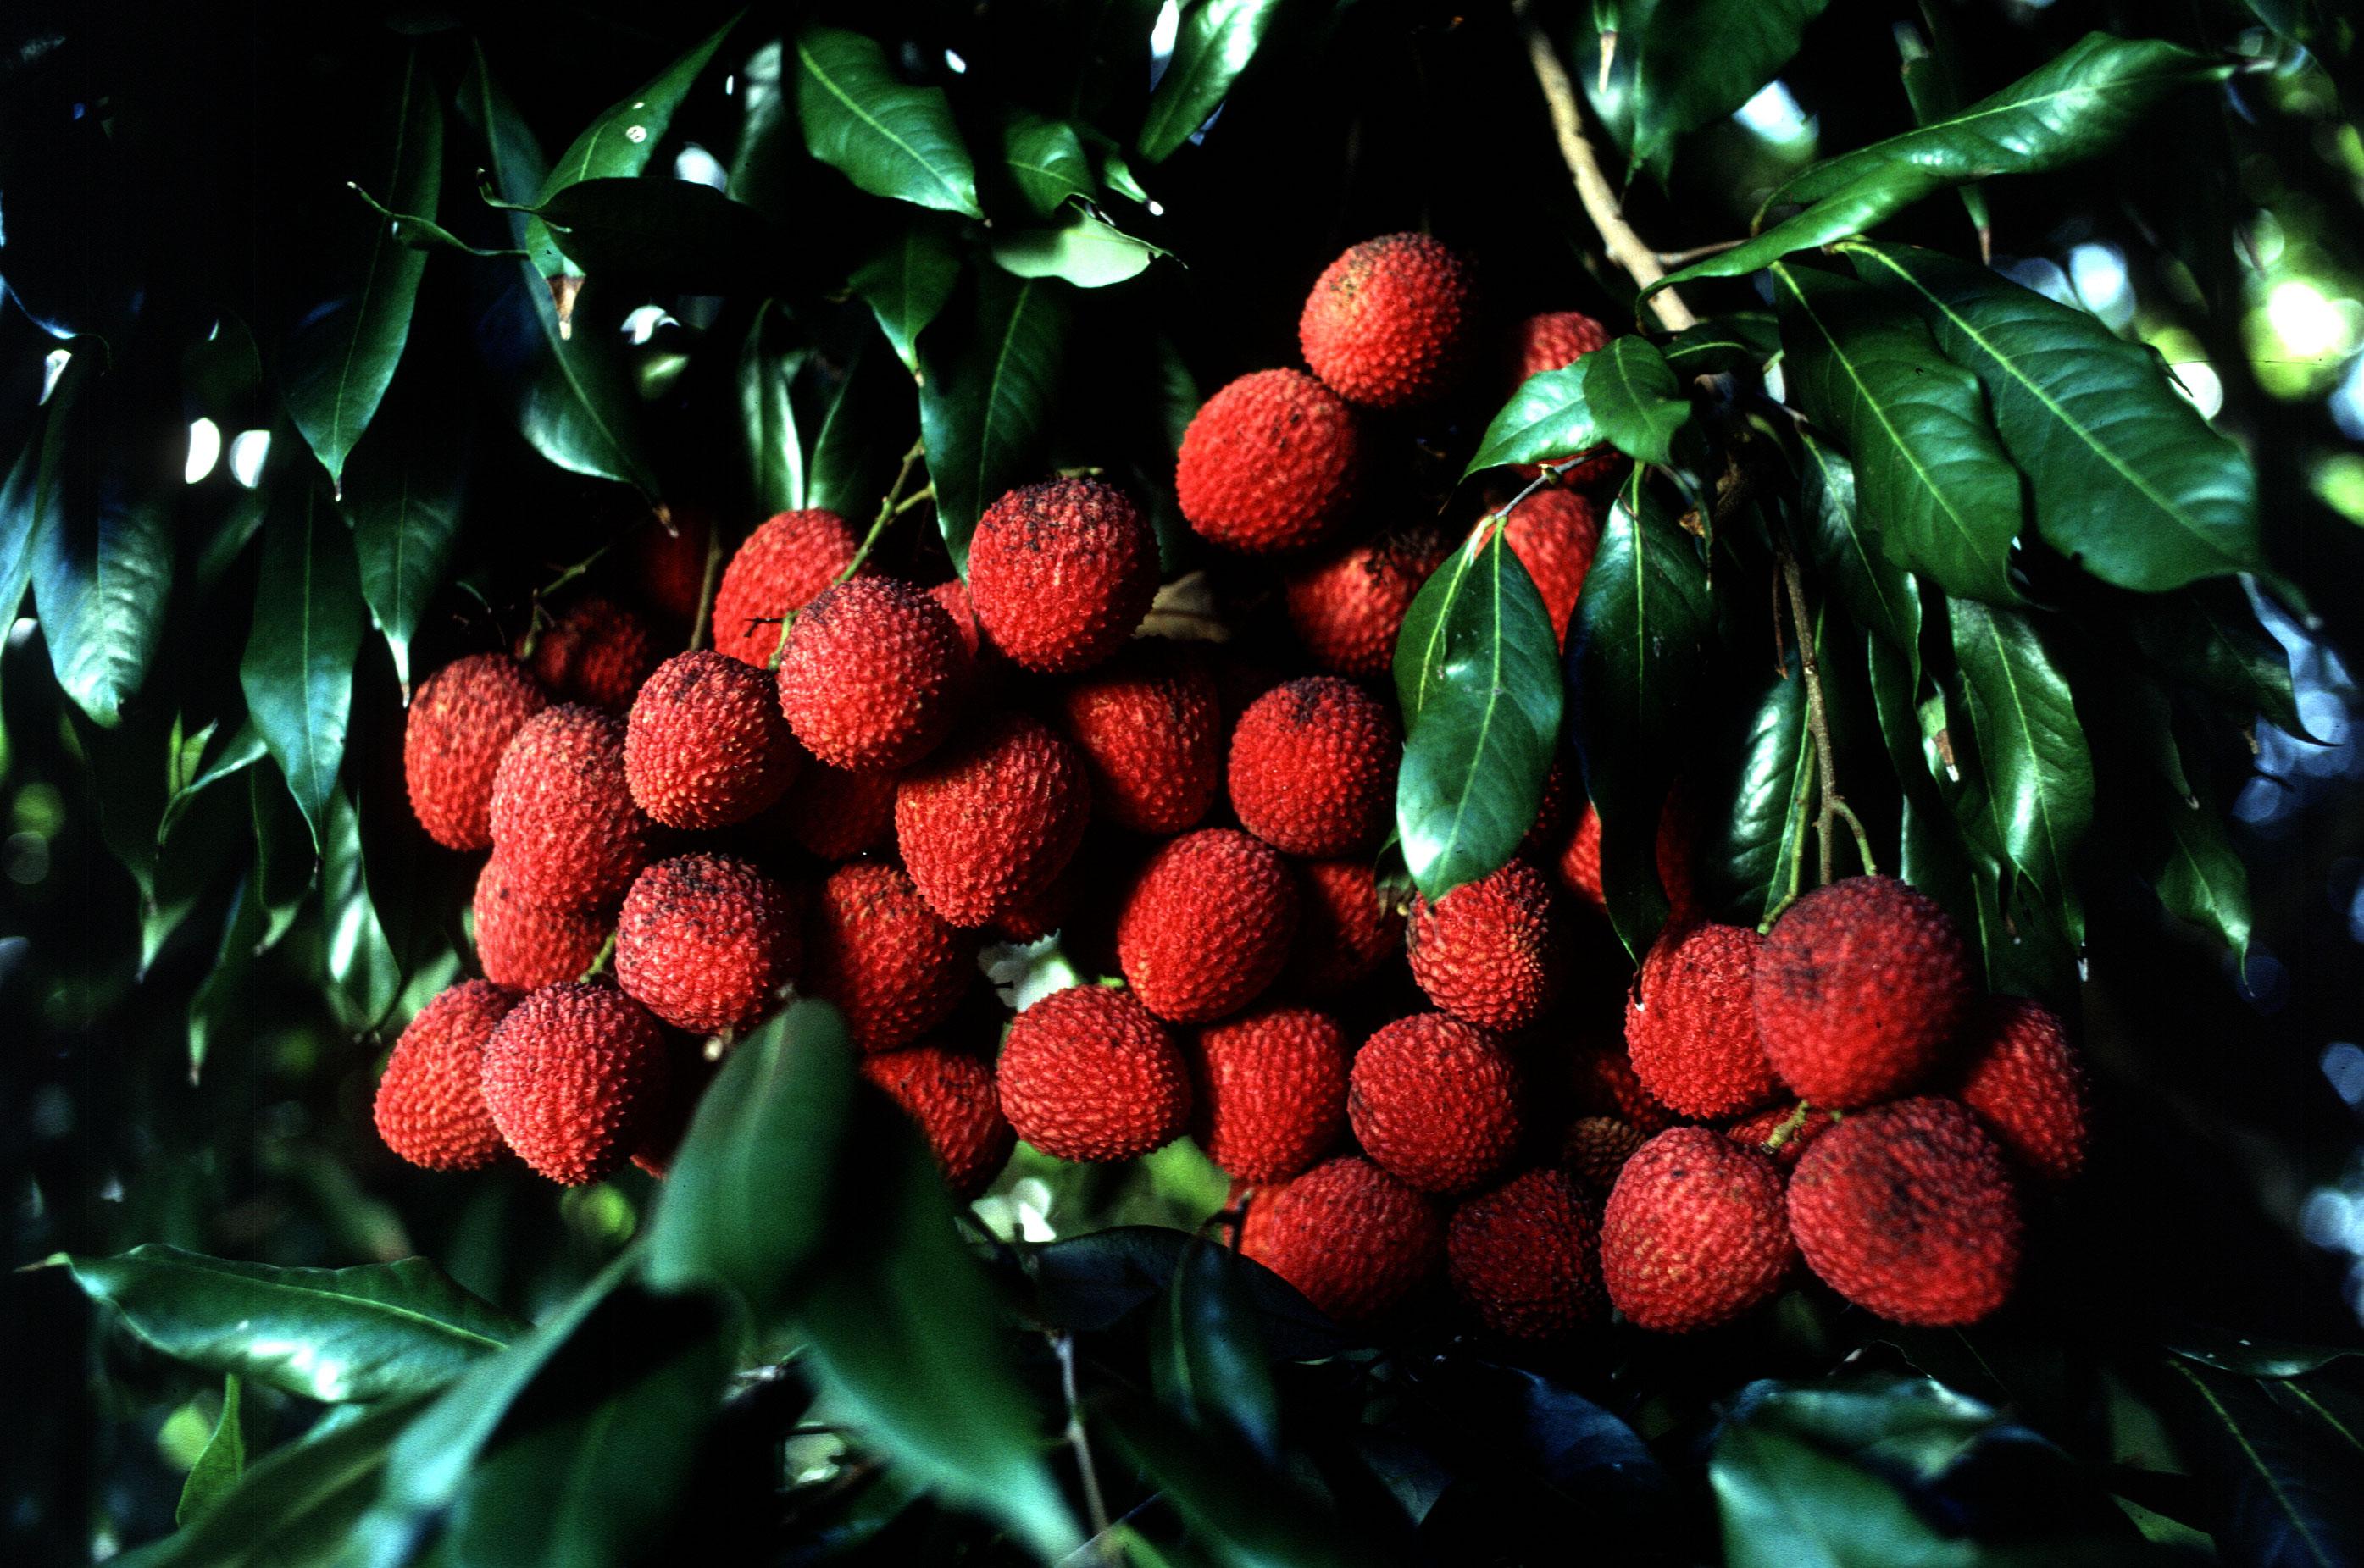 File:Lychee.jpg - Wikipedia Leeches Fruit Tree